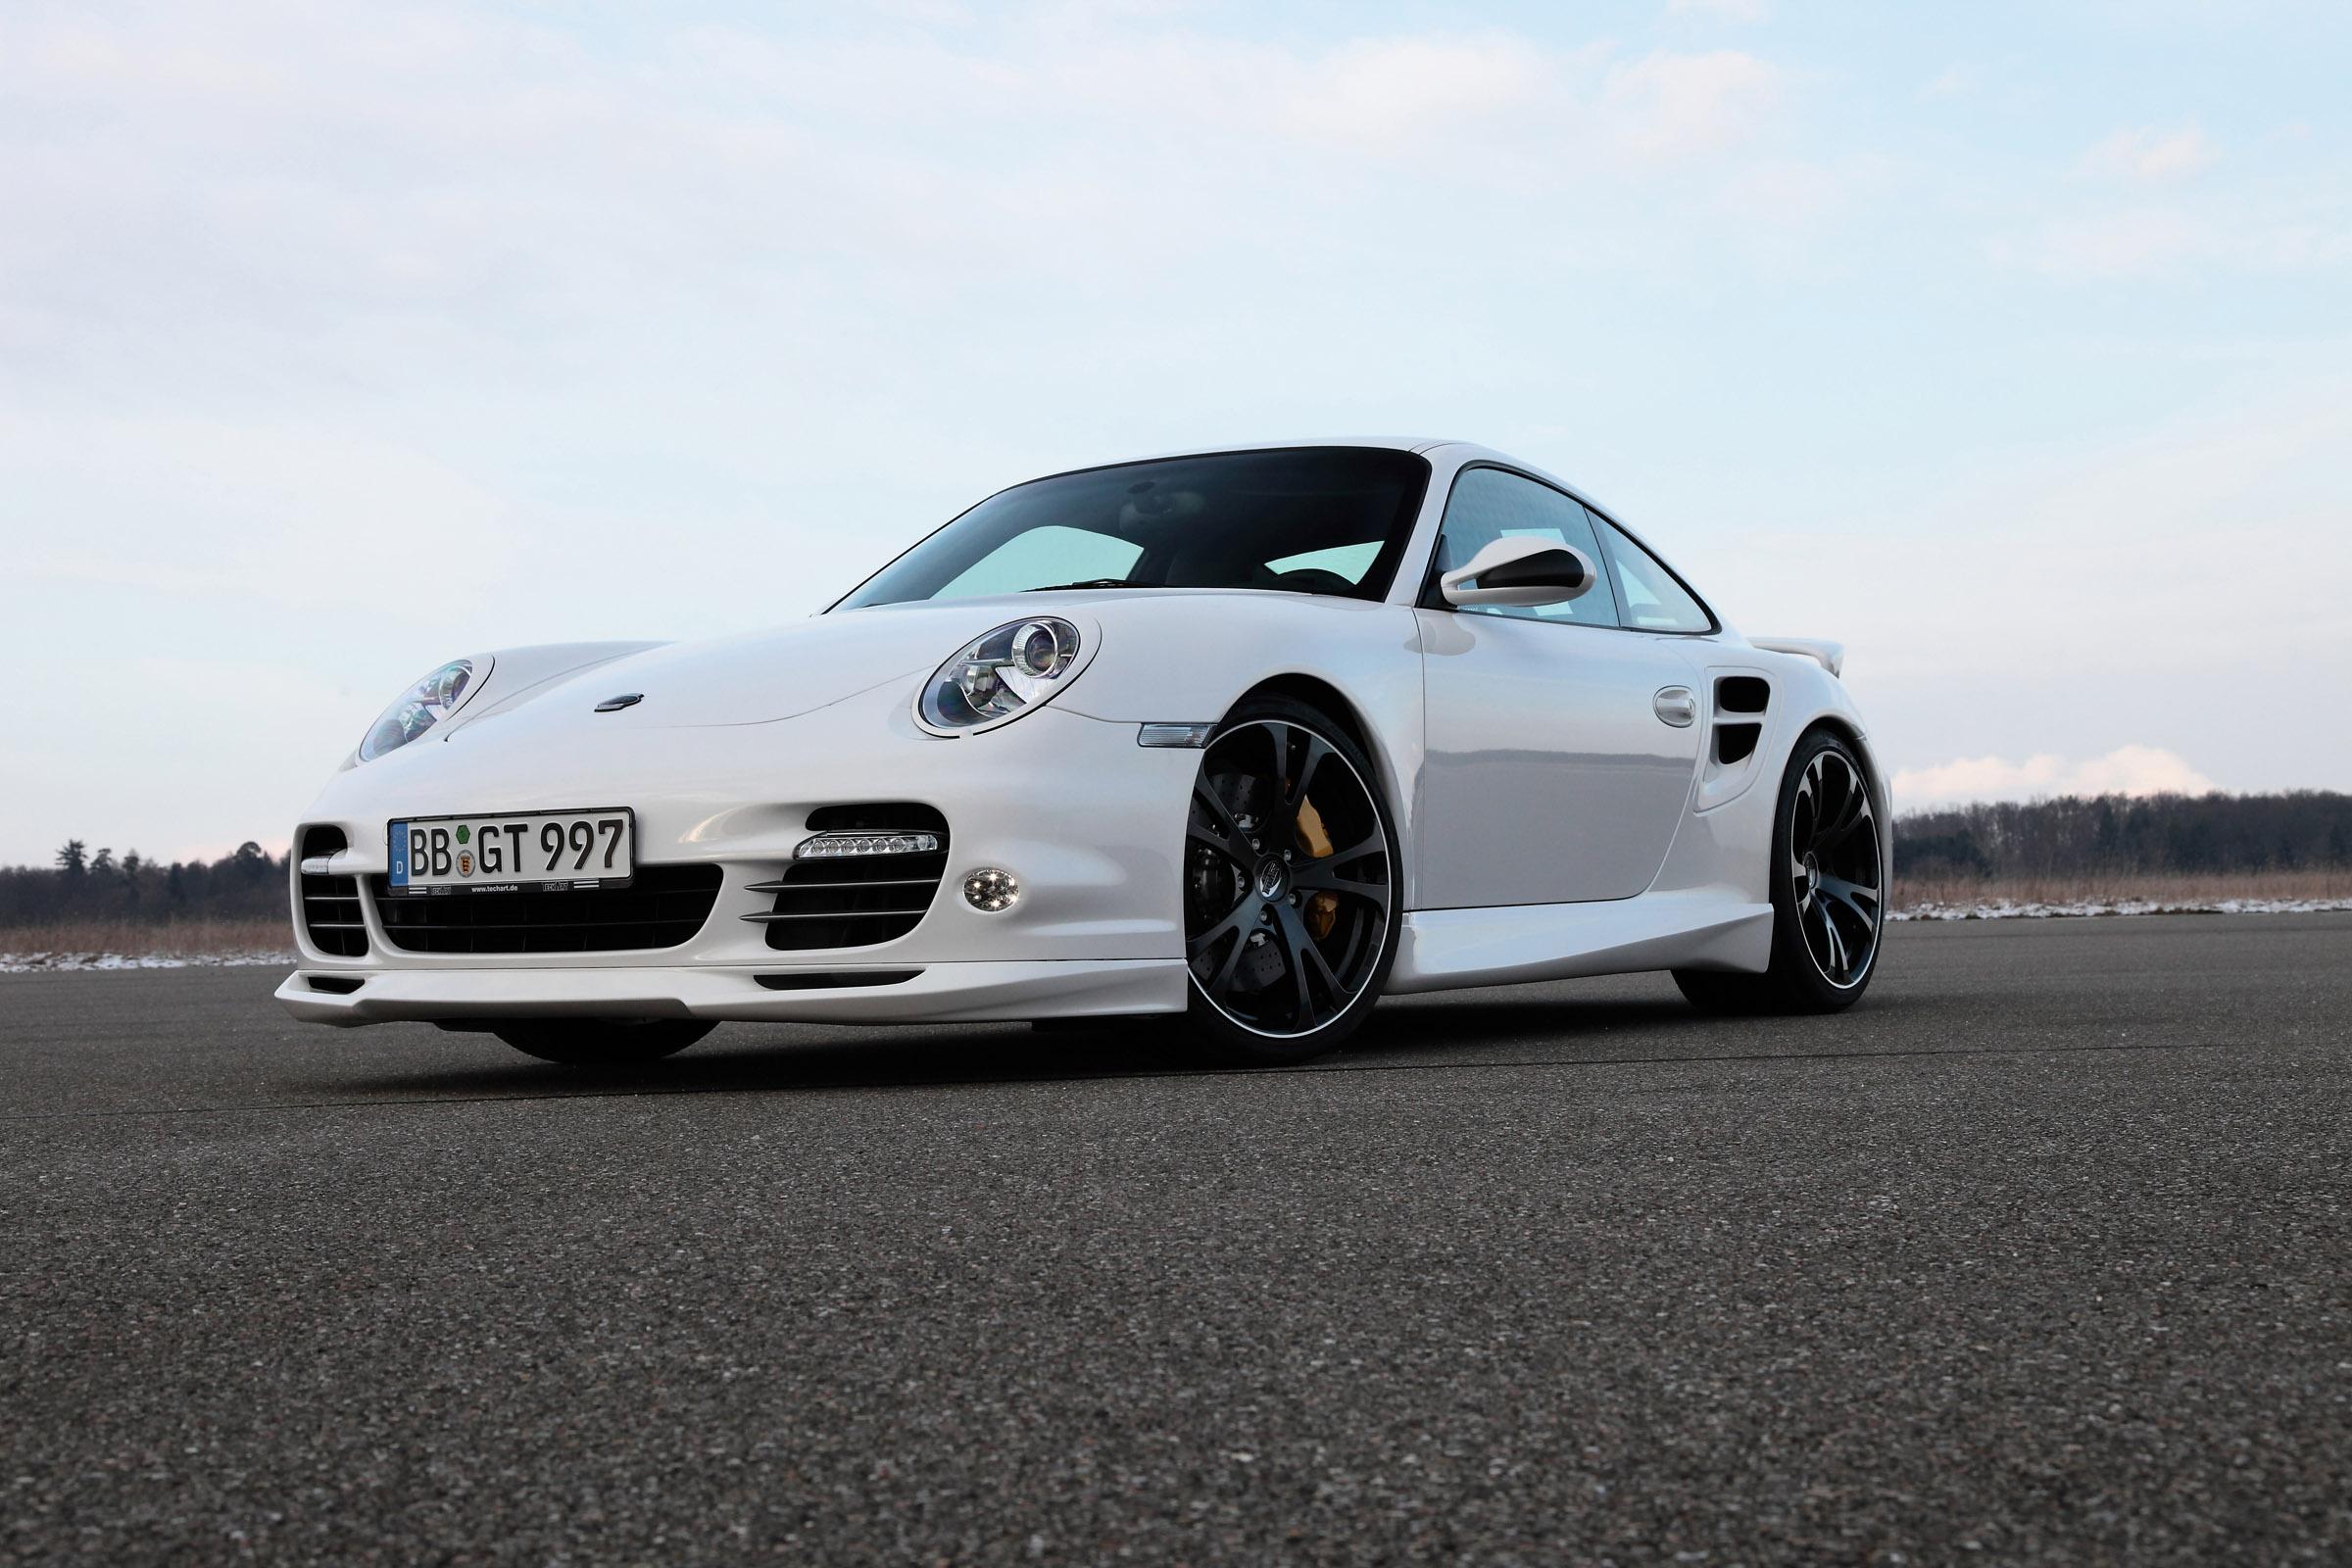 Techart Porsche 911 Turbo S Picture 32857